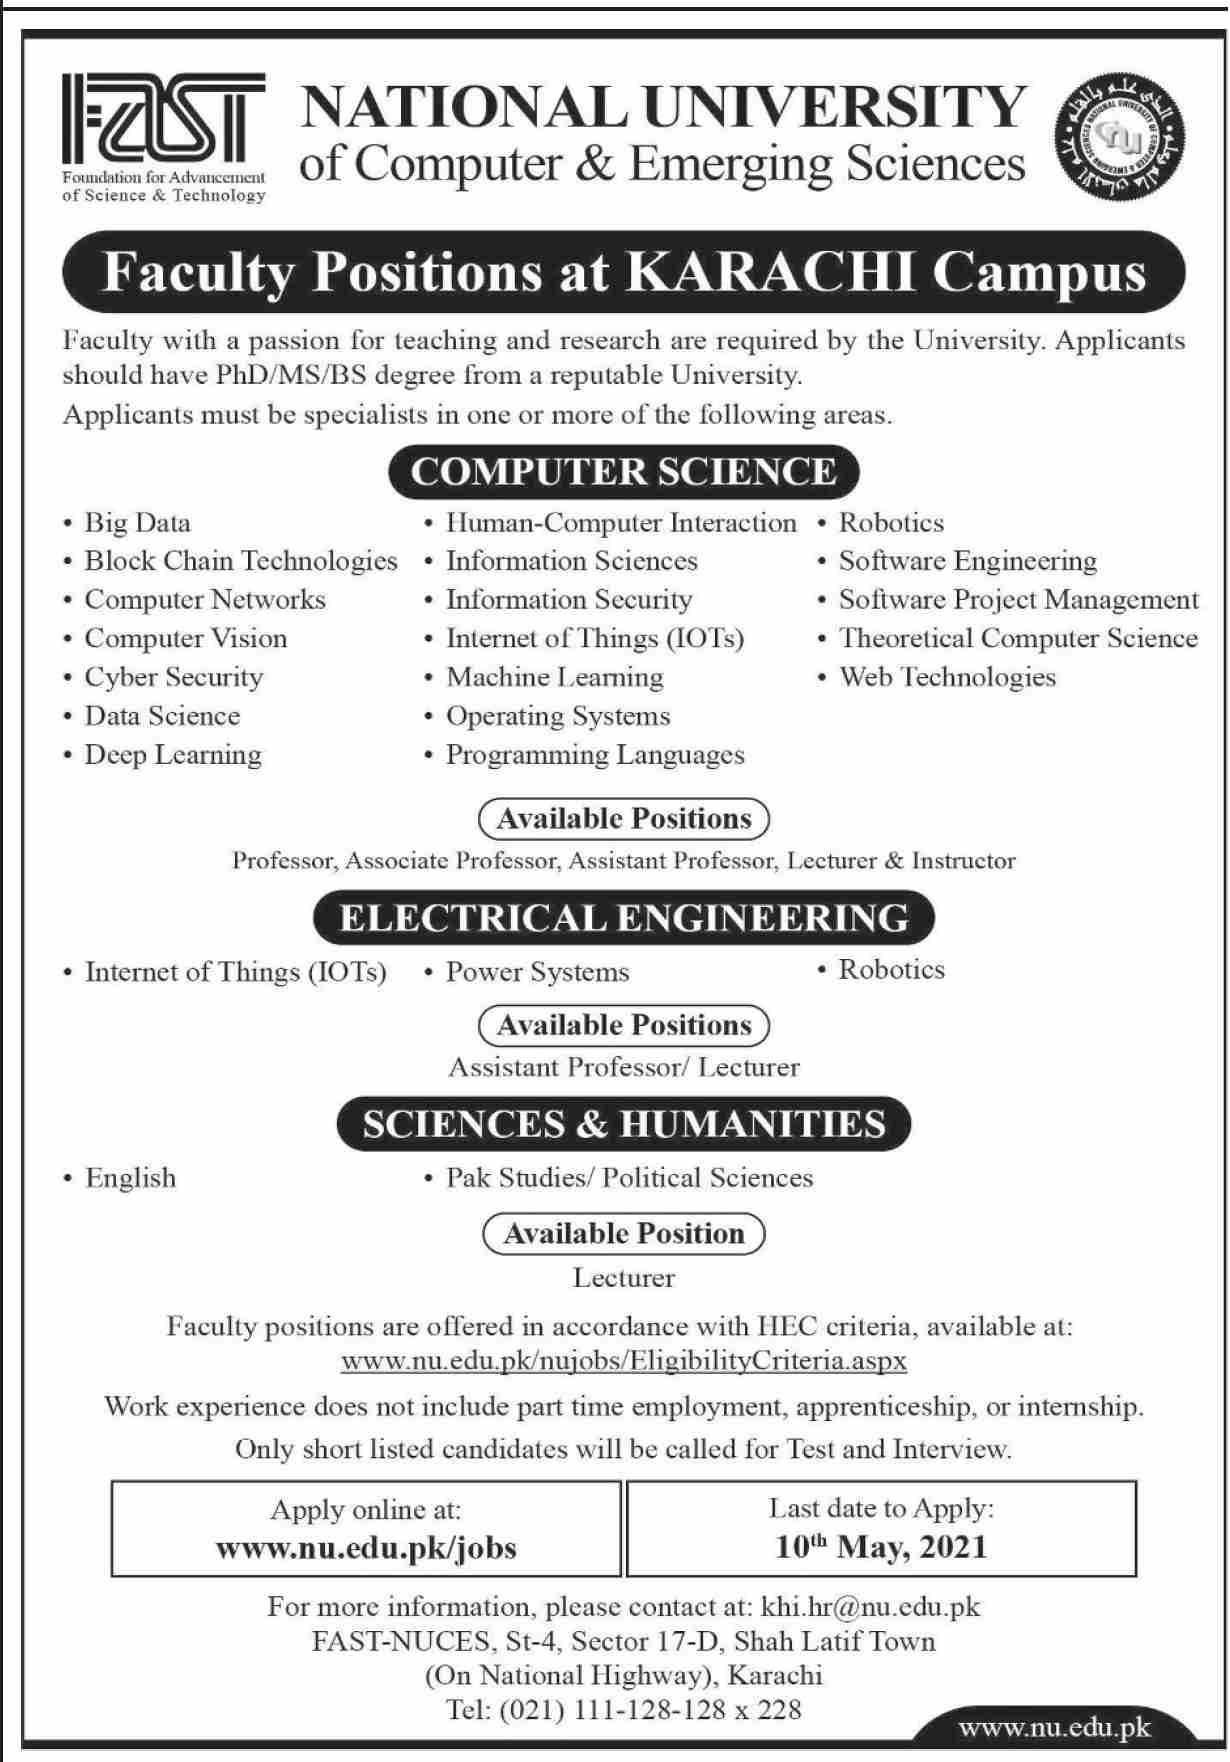 National University of Computer & Emerging Sciences Jobs 2021 in Pakistan